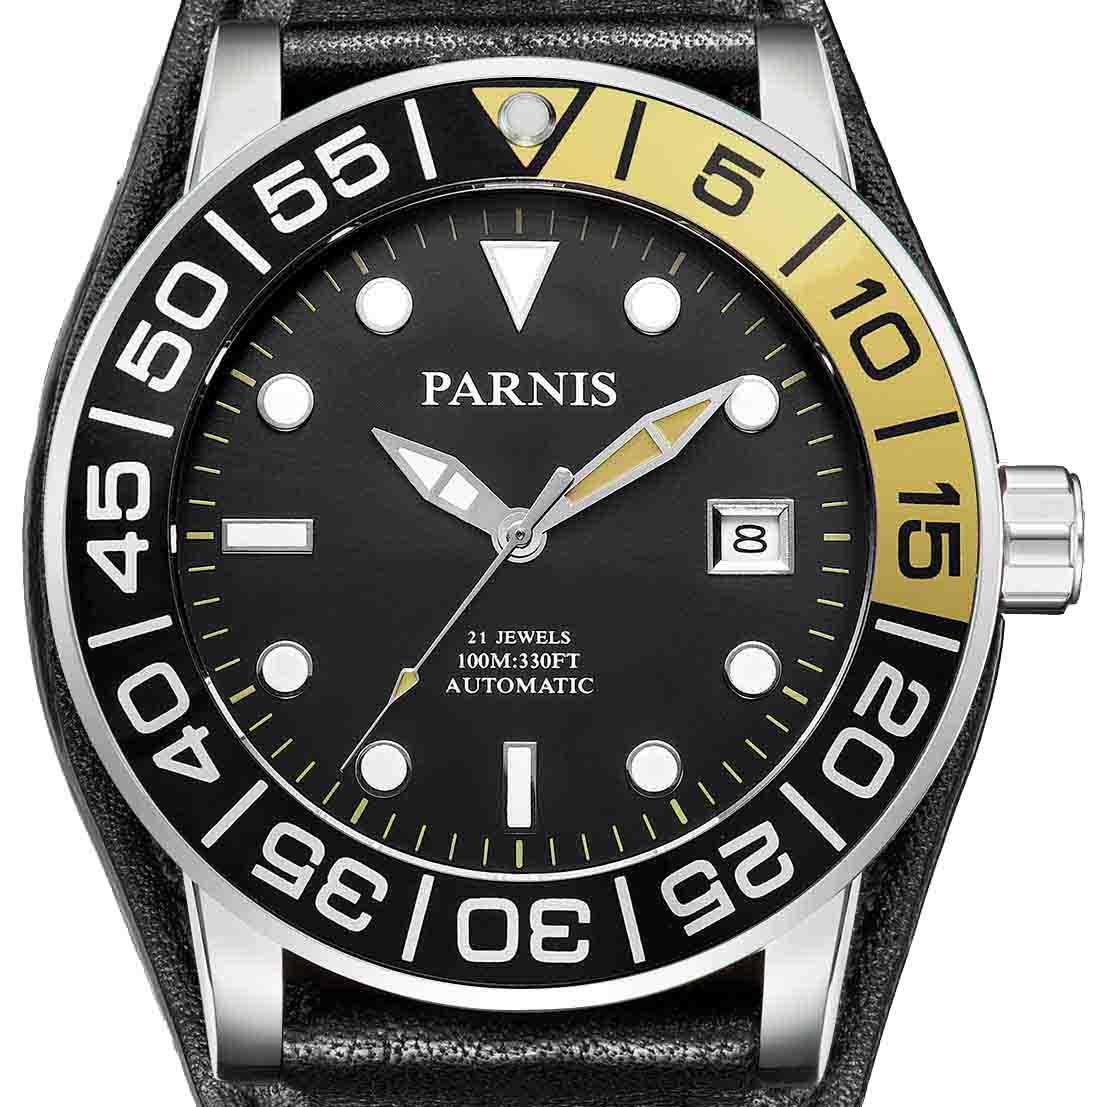 【NEW】PARNIS パーニス 自動巻き 腕時計  [PA6056-S3AL-SVBK] 並行輸入品 純正ケース メーカー保証12ヶ月